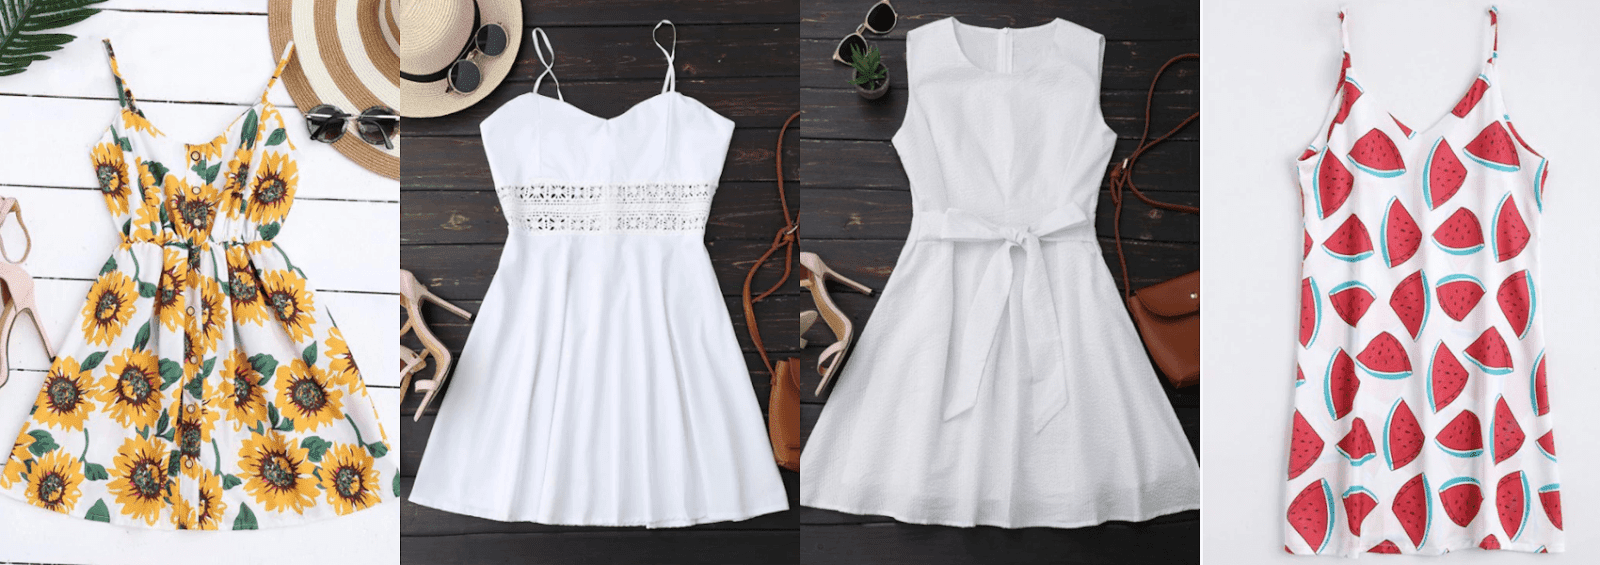 vestidos brancos zaful